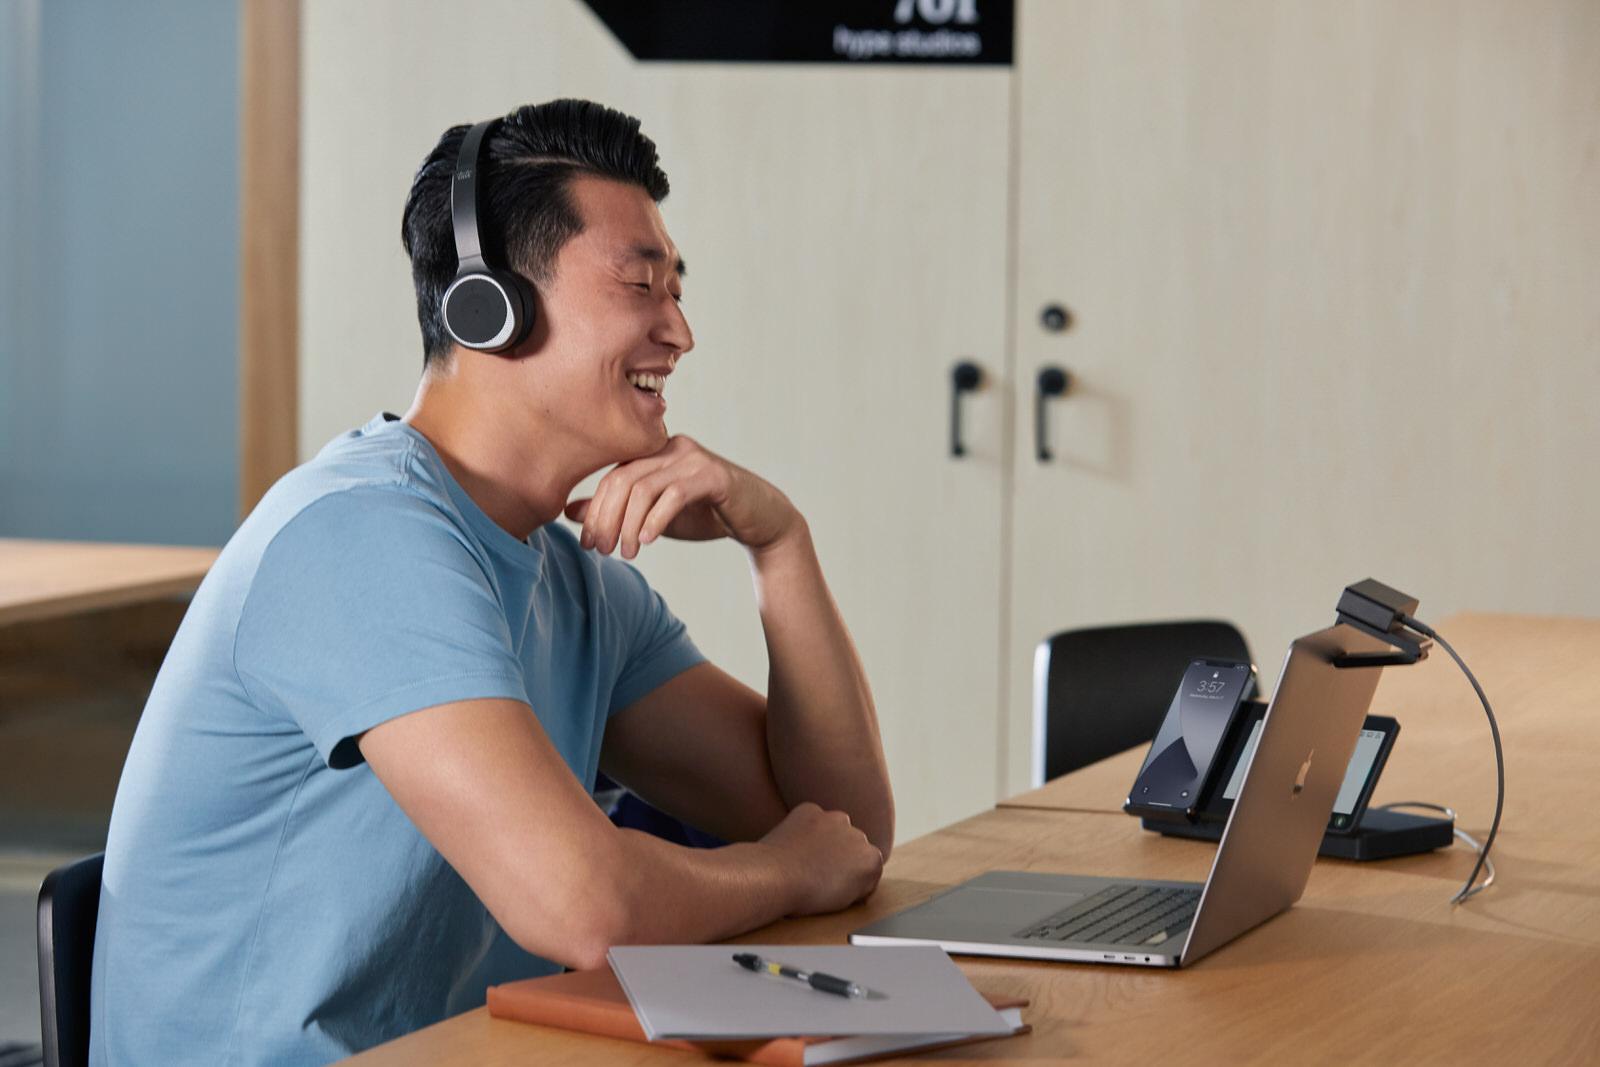 Cisco Webex, lifestyle, tech, Justin Chung